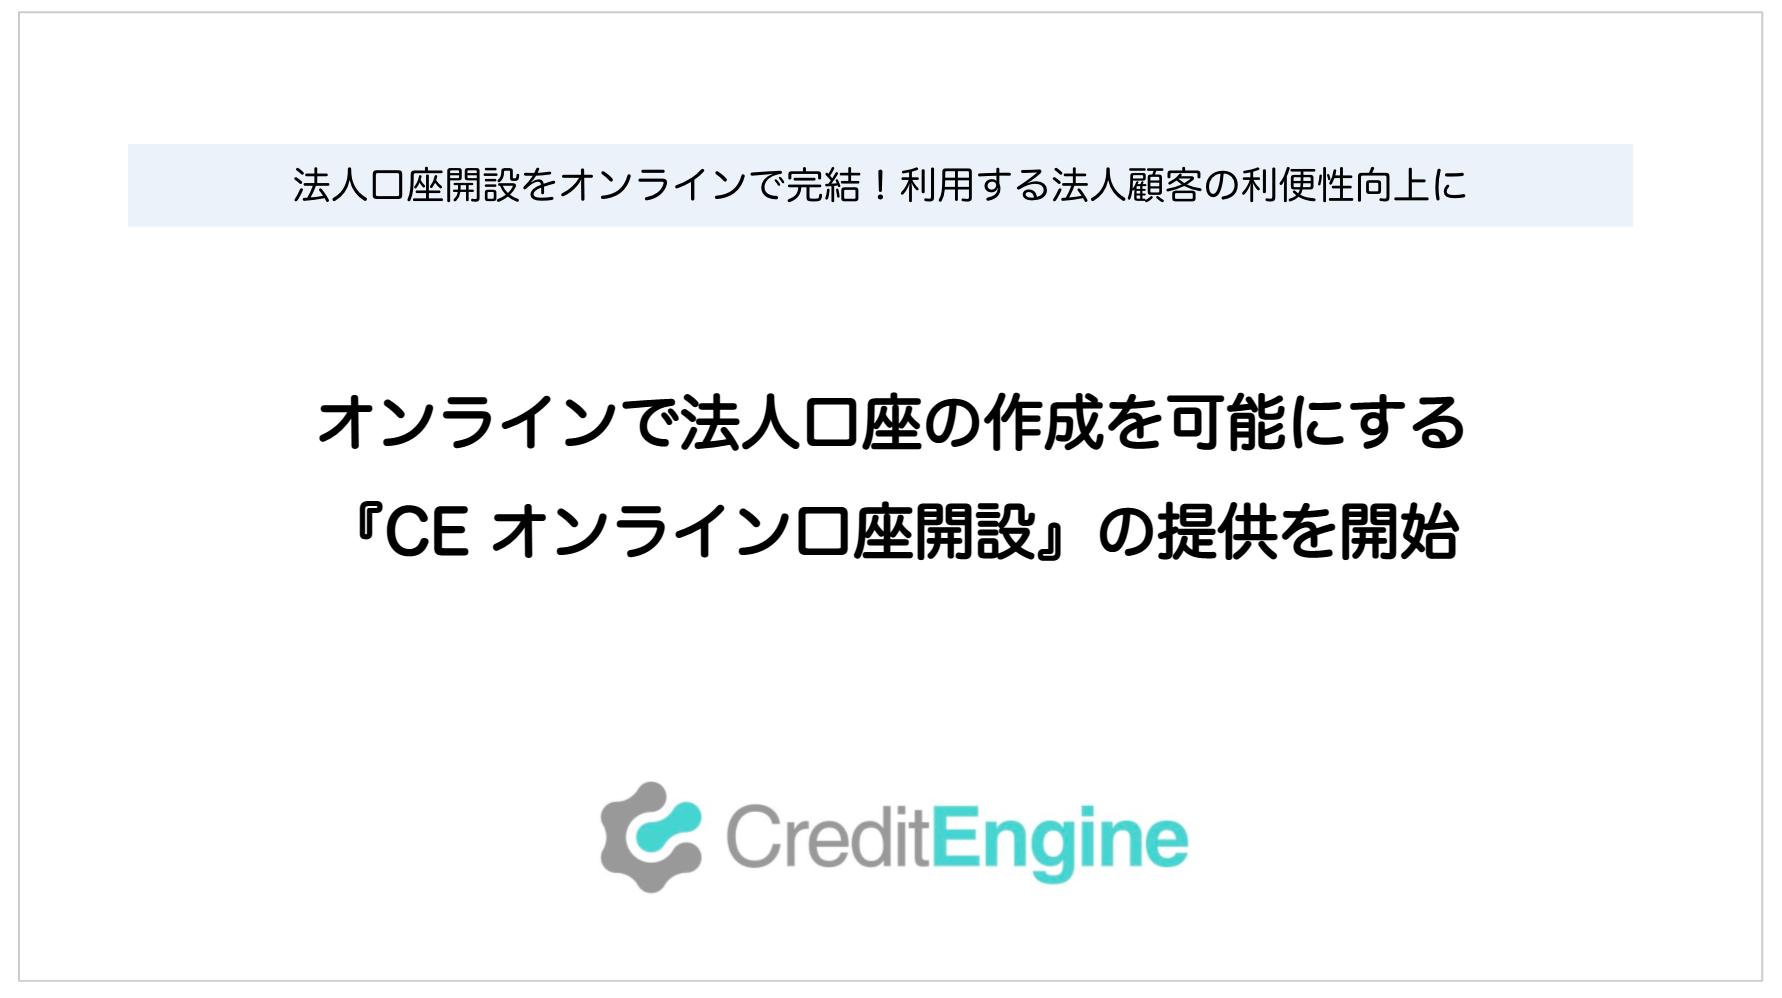 CE オンライン口座開設_f.png